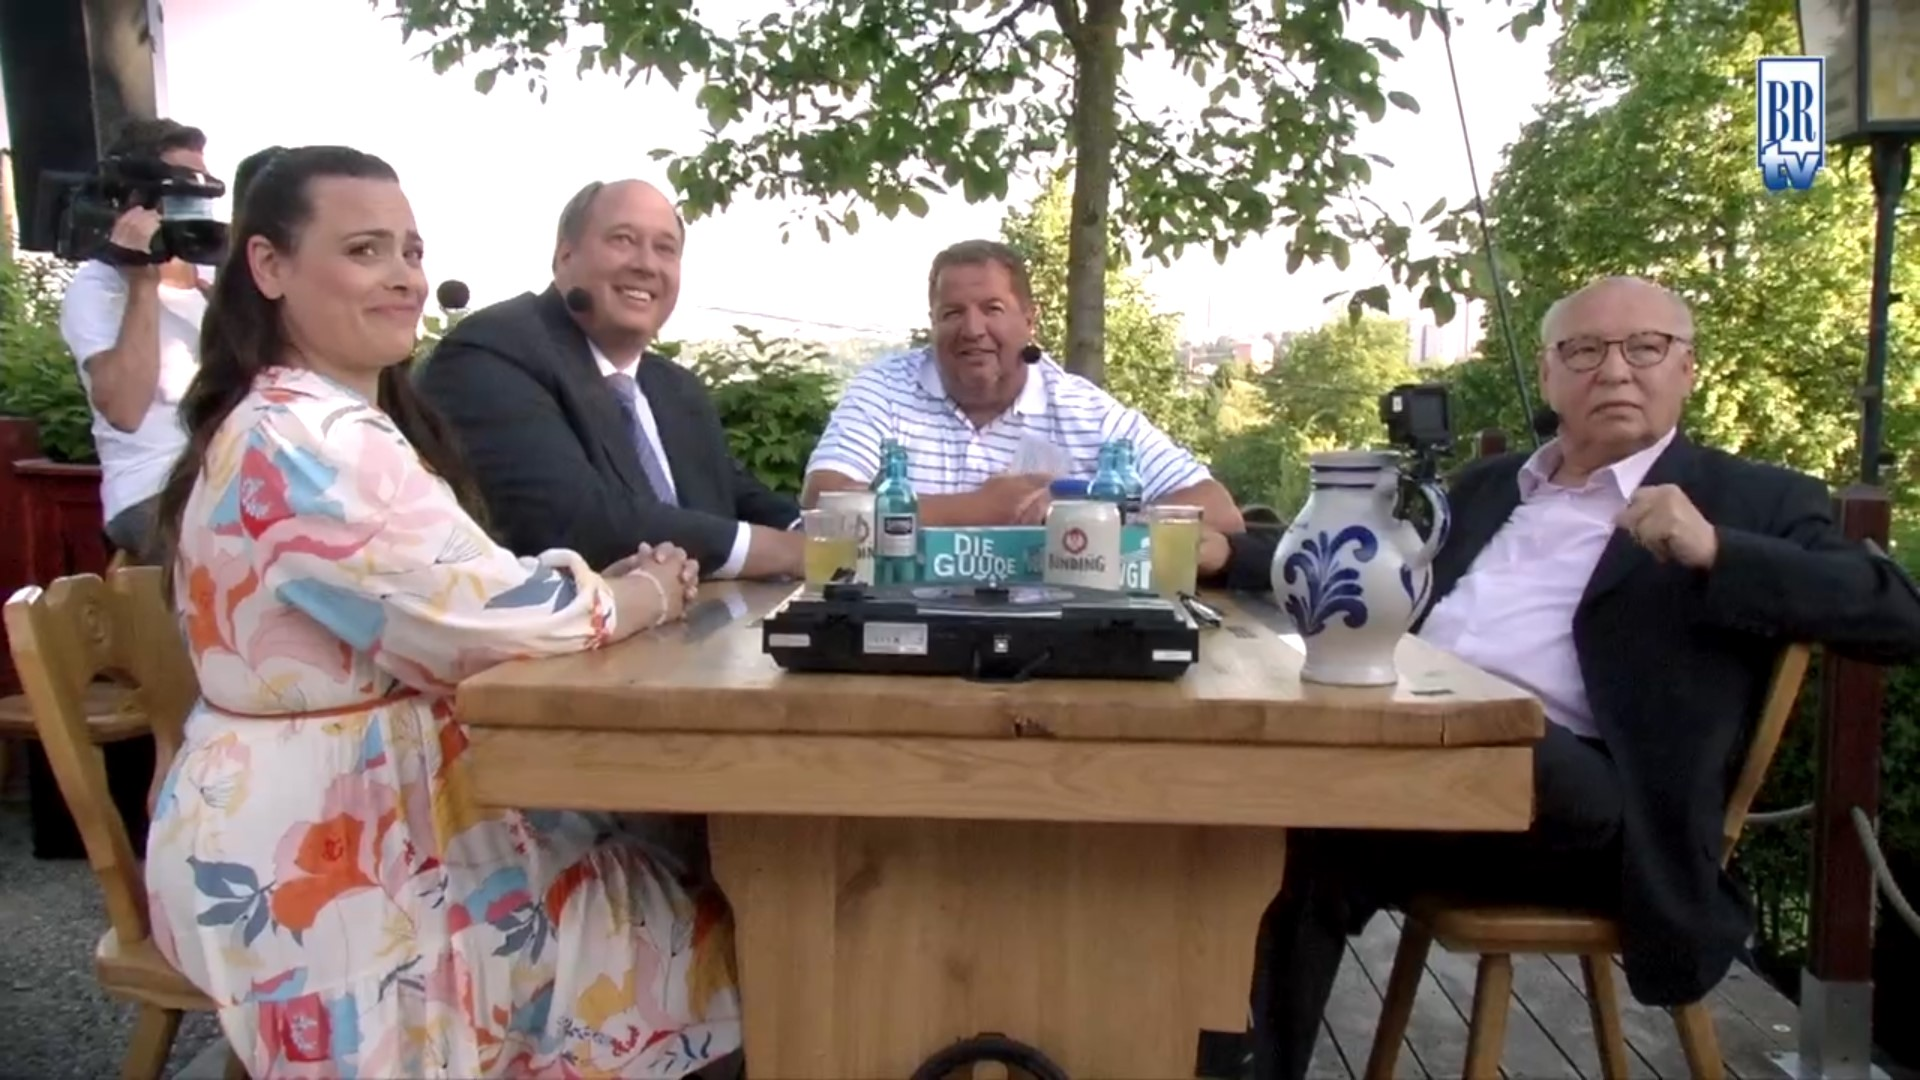 Bembel & Gebabbel – Folge 57 mit Prof. Dr. Helge Braun, Leonie Koch & Hans-Joachim Heistb